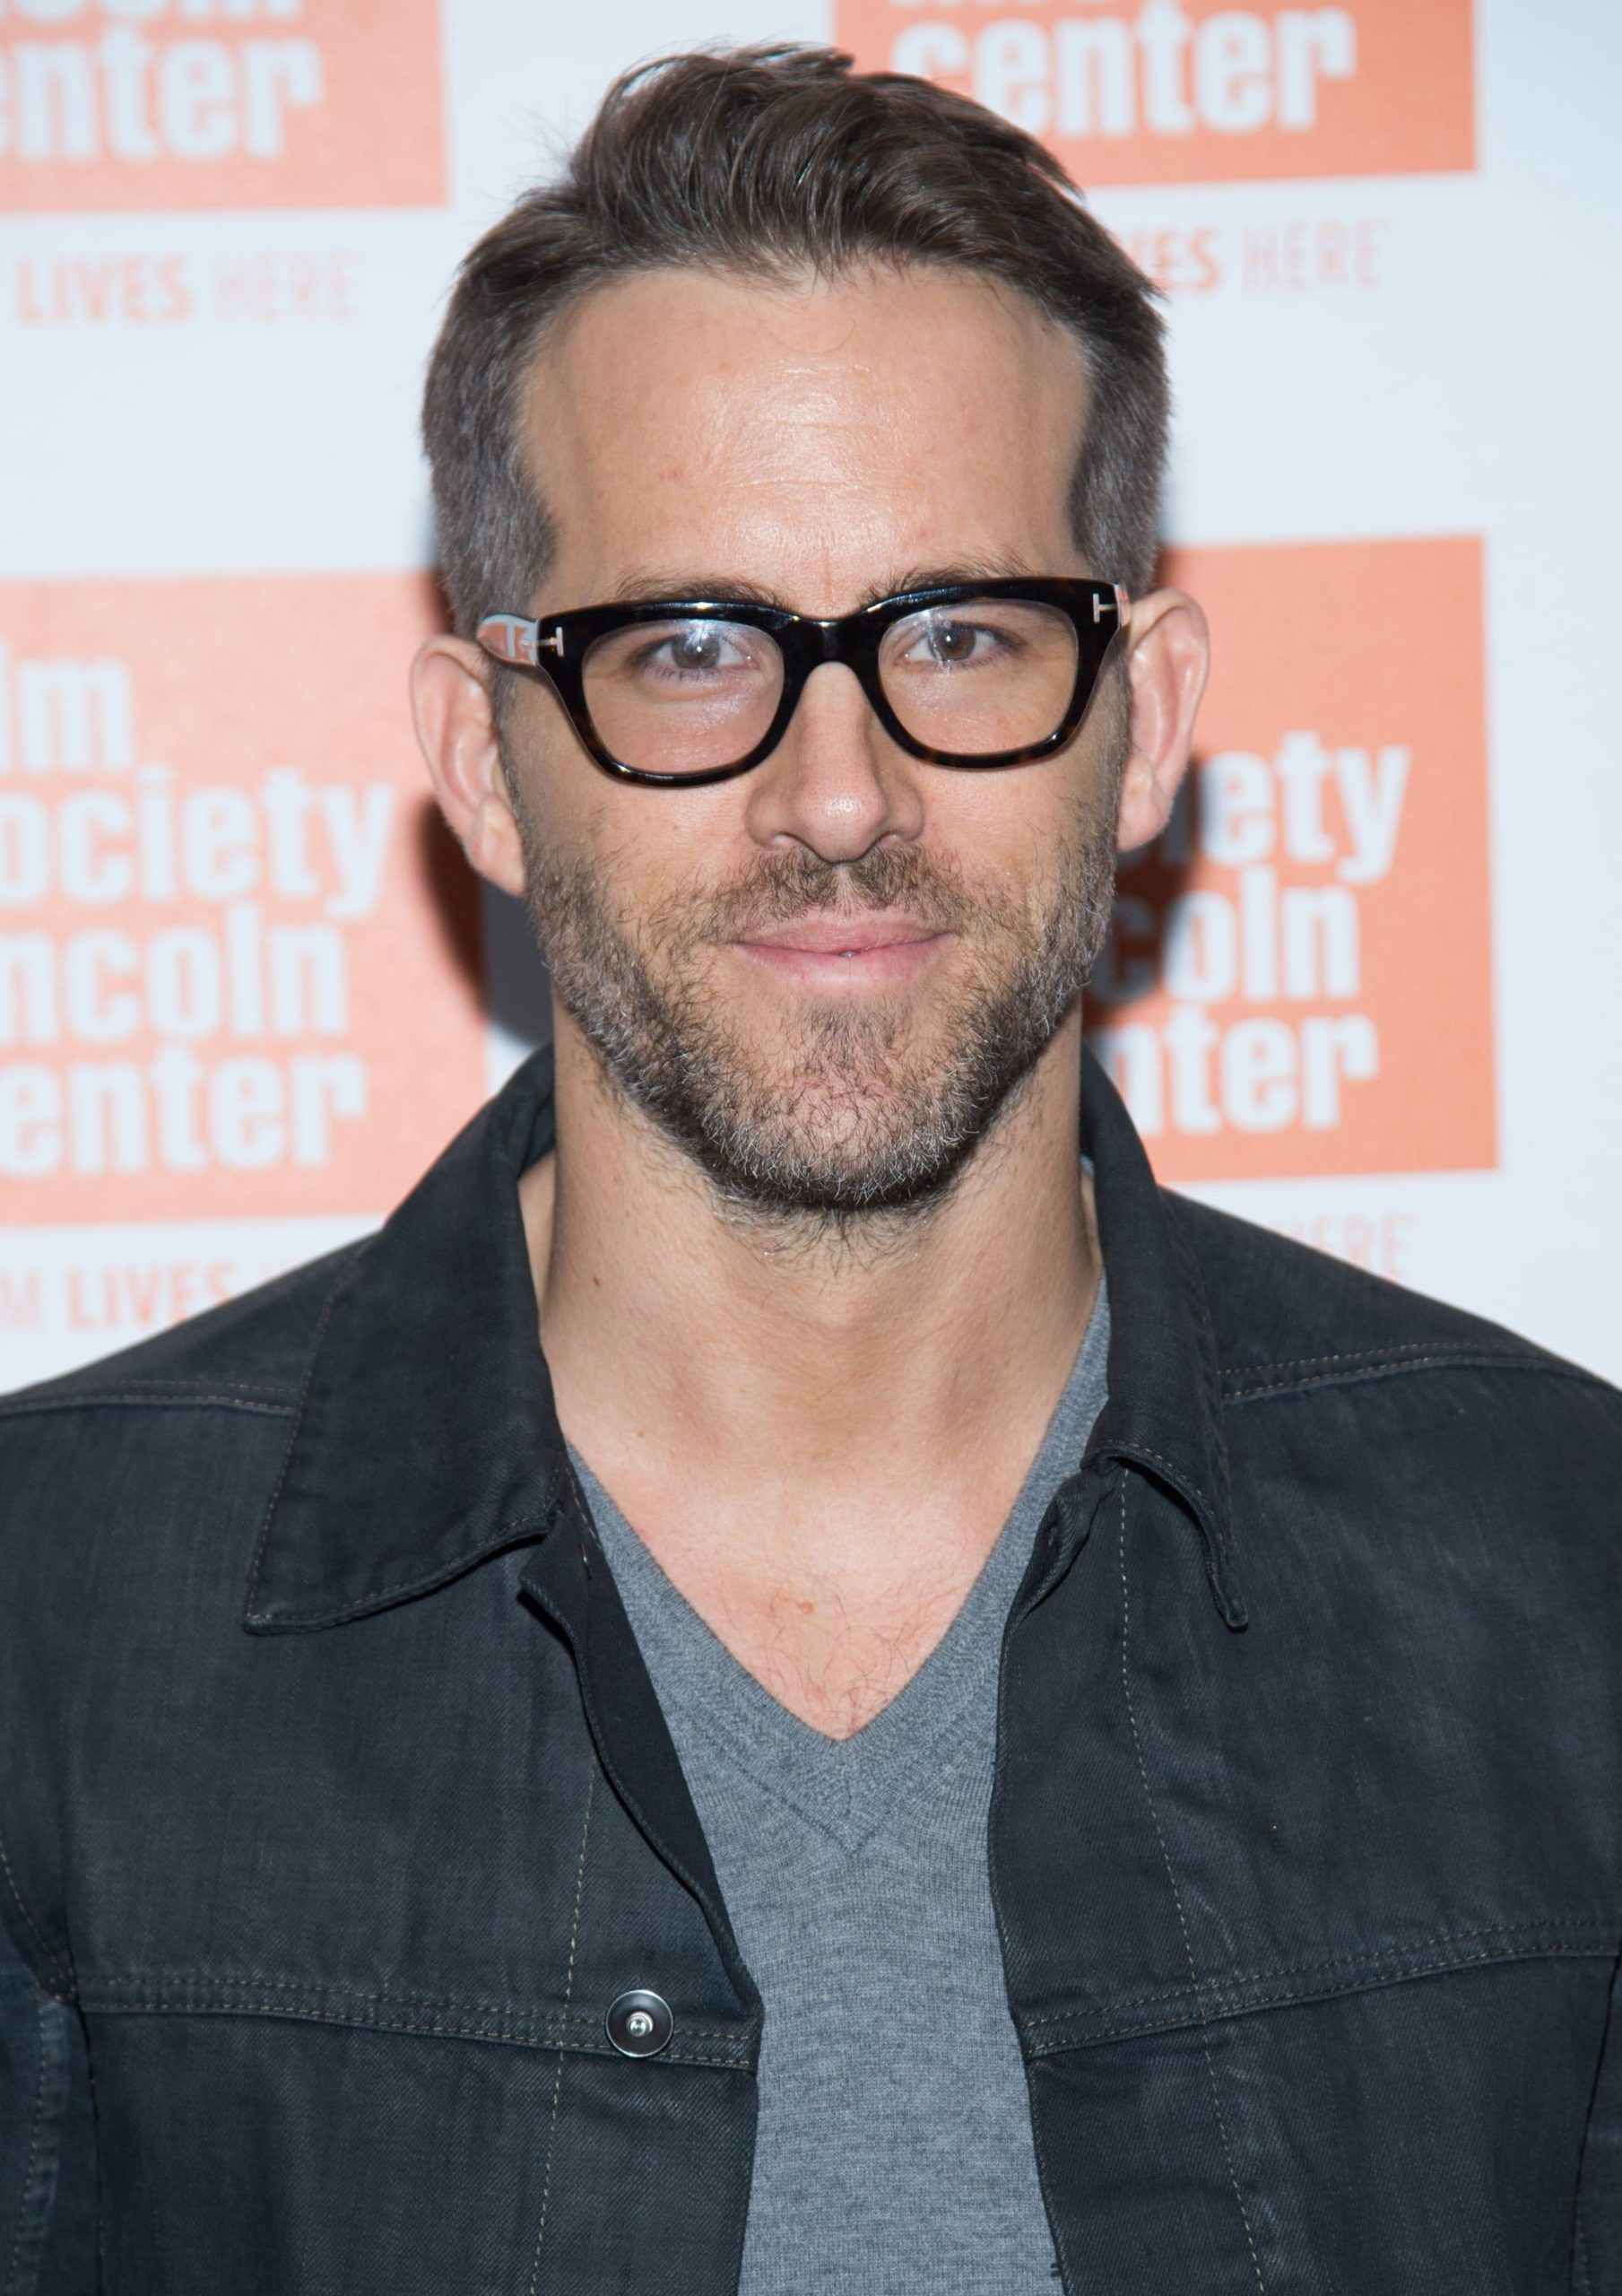 Ryan Reynolds Future plans with Deadpool